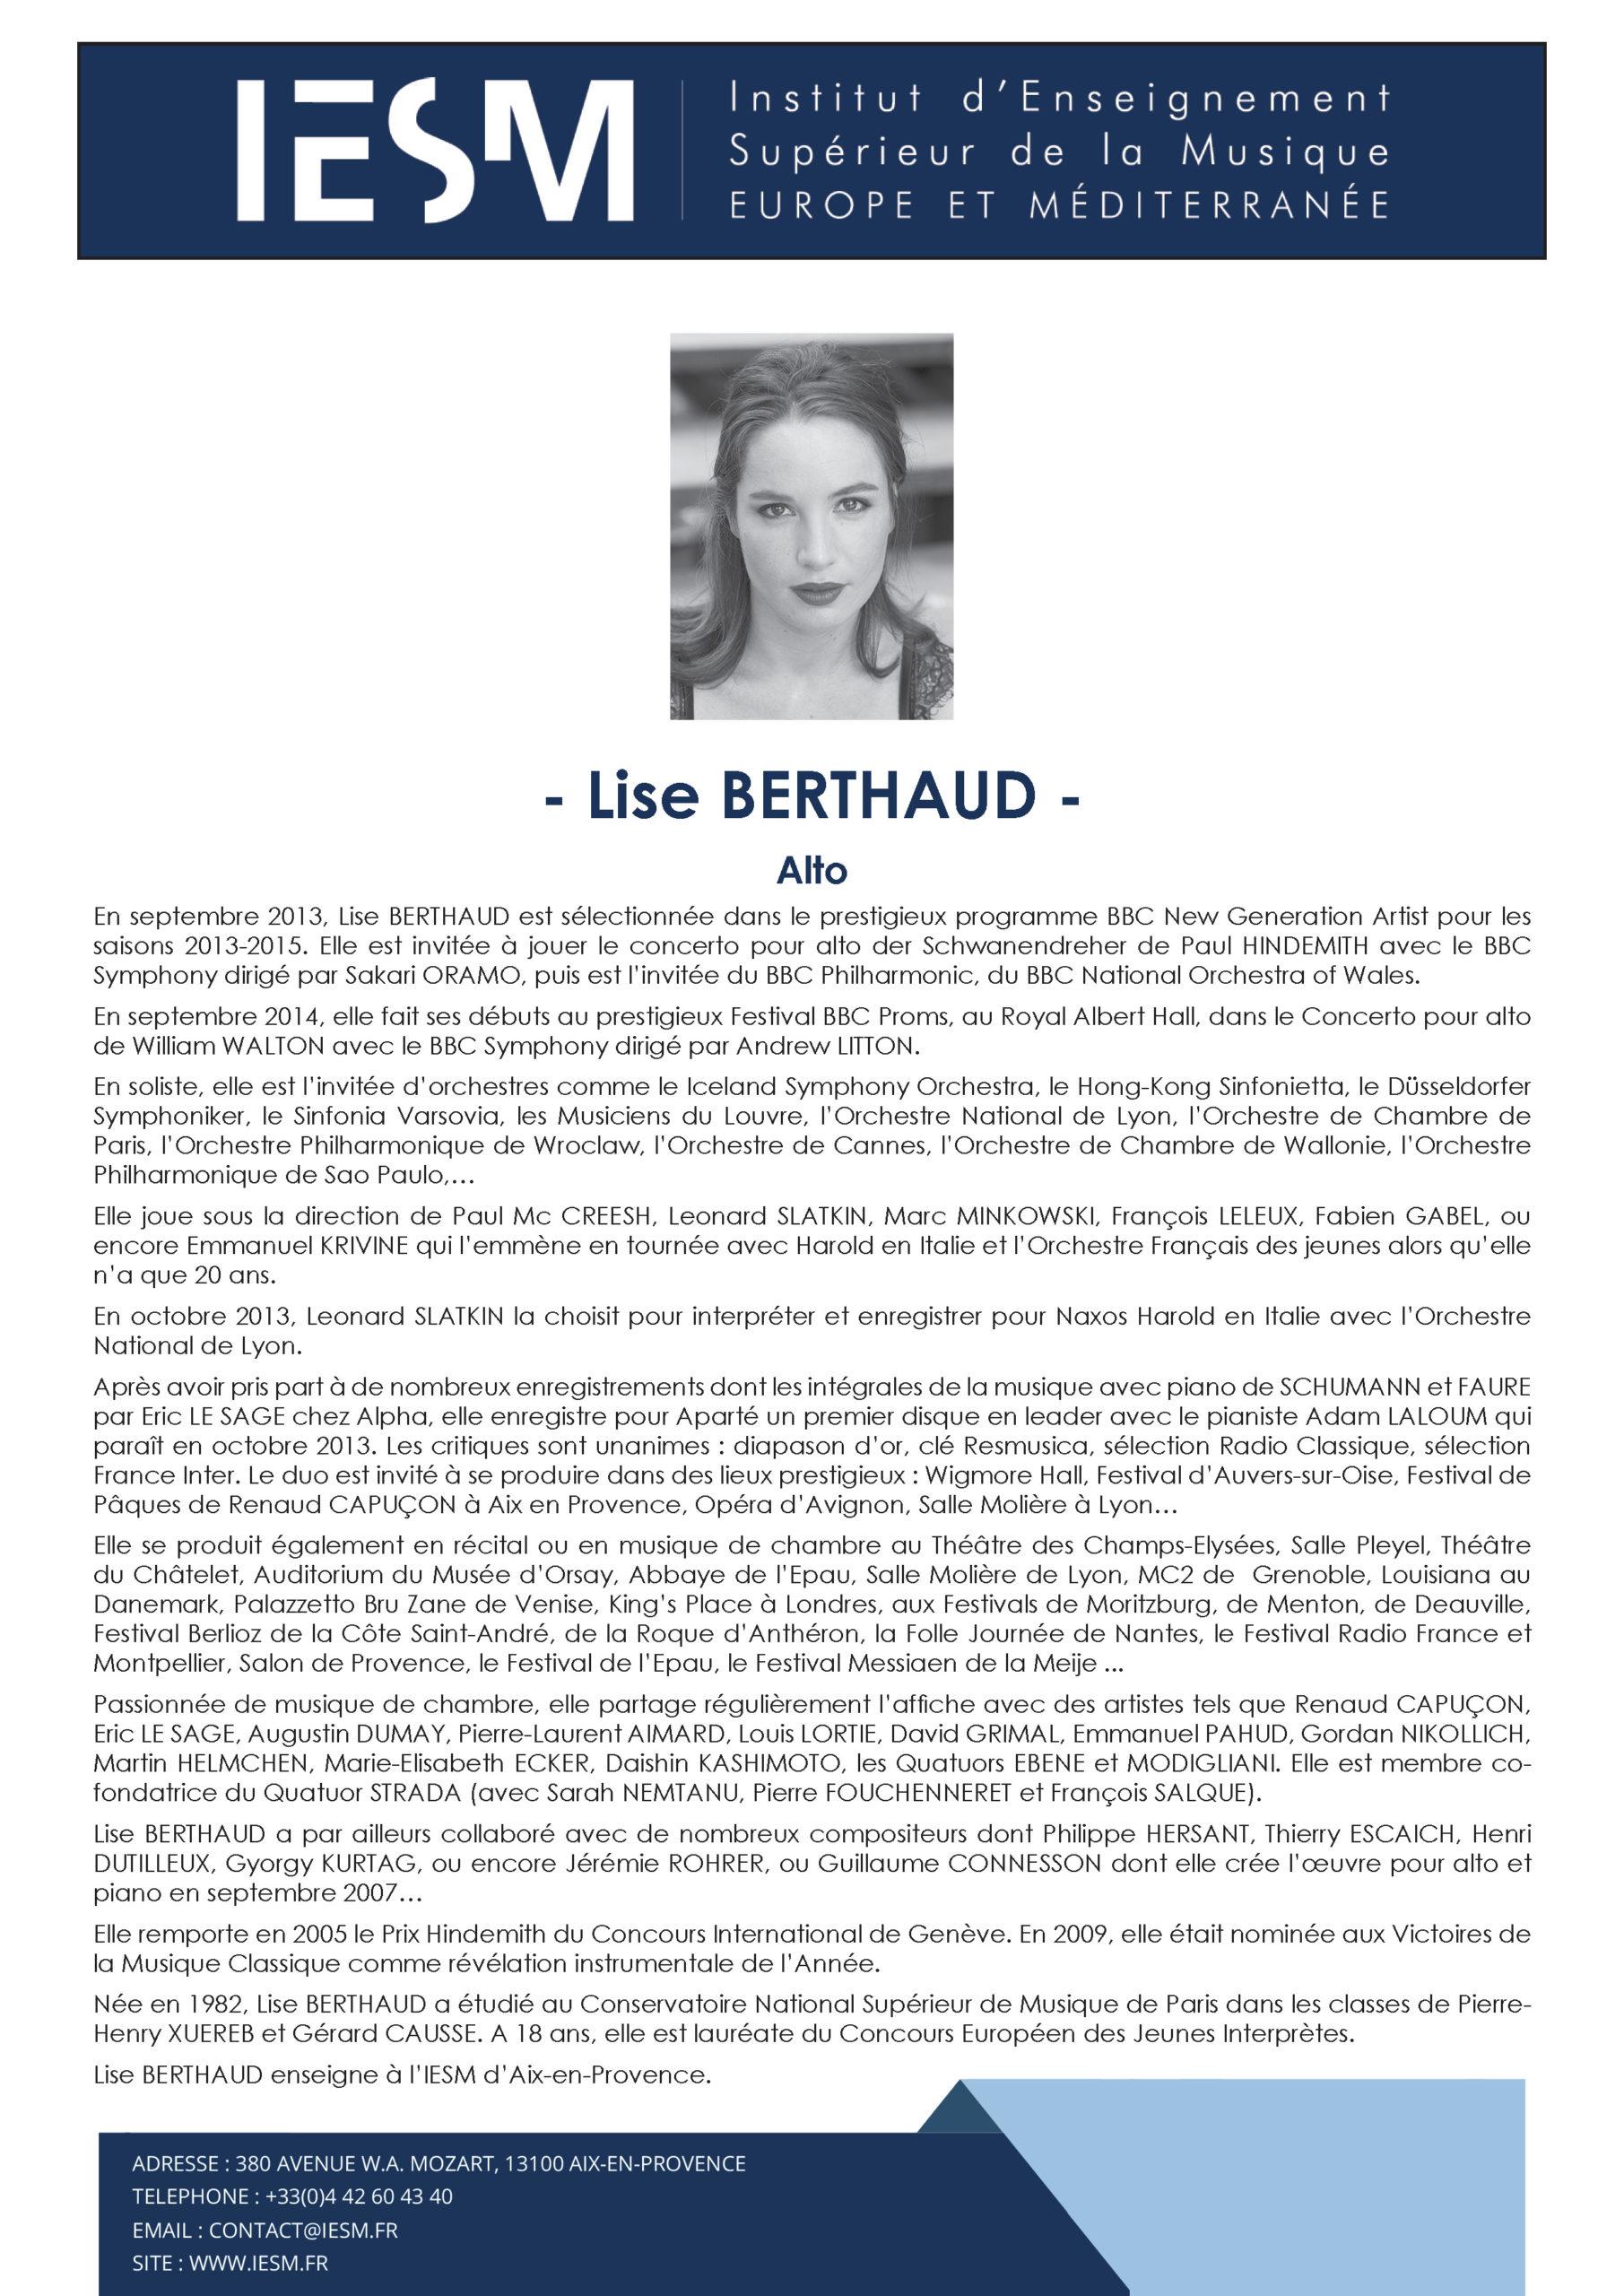 BERTHAUD Lise scaled